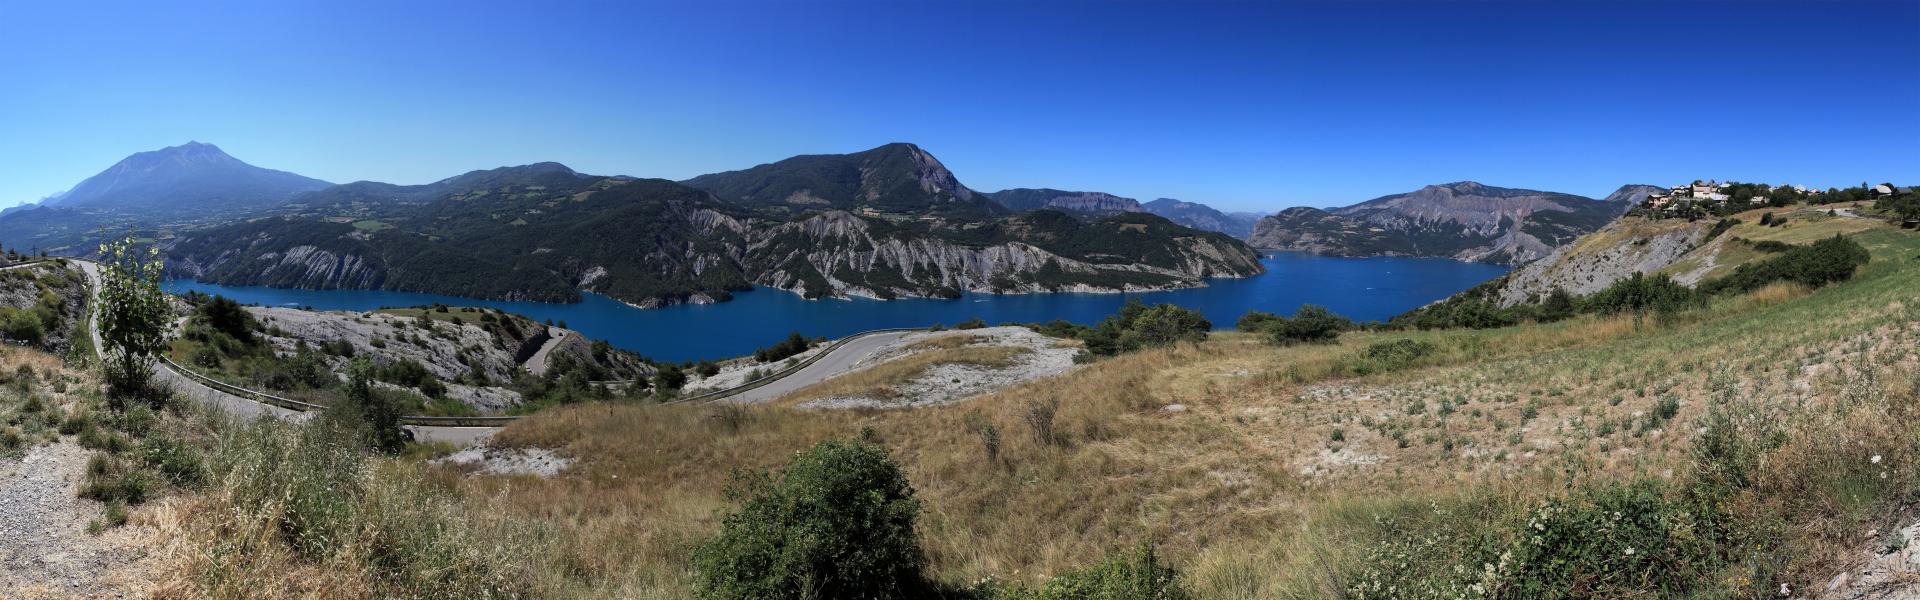 047 Lac de Serre-Ponçon